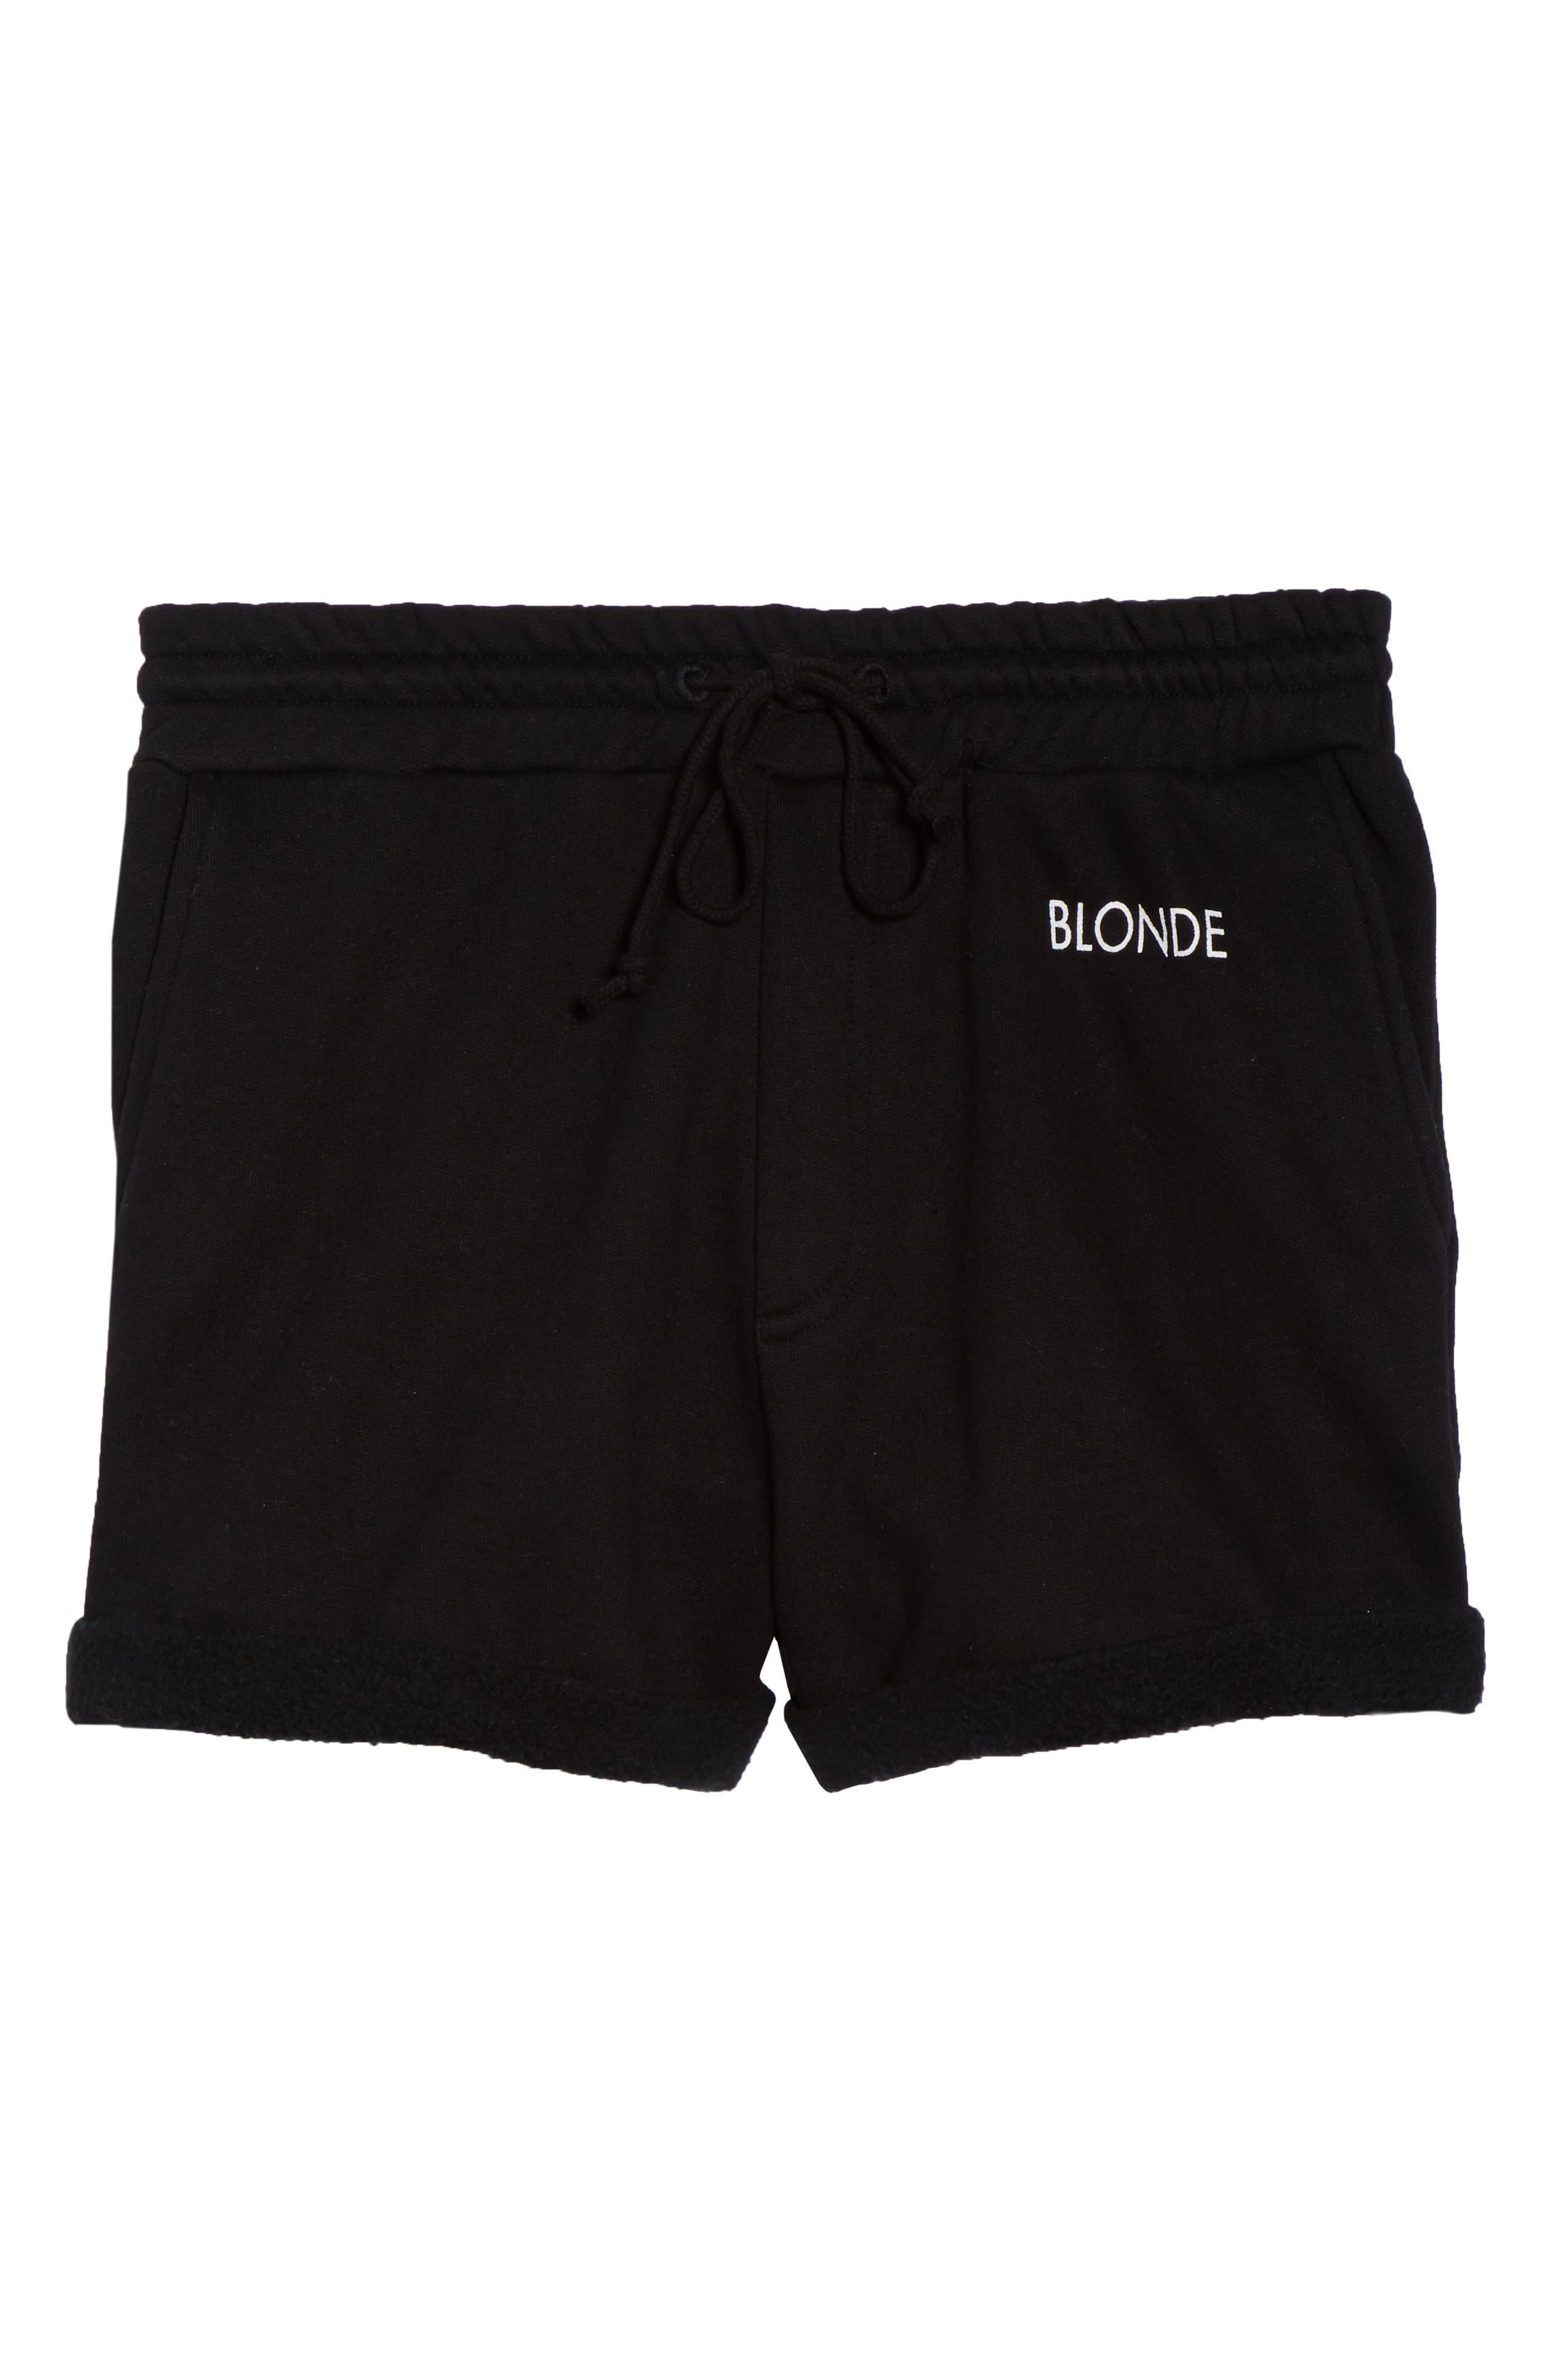 Blonde Lounge Shorts,                             Alternate thumbnail 4, color,                             Black